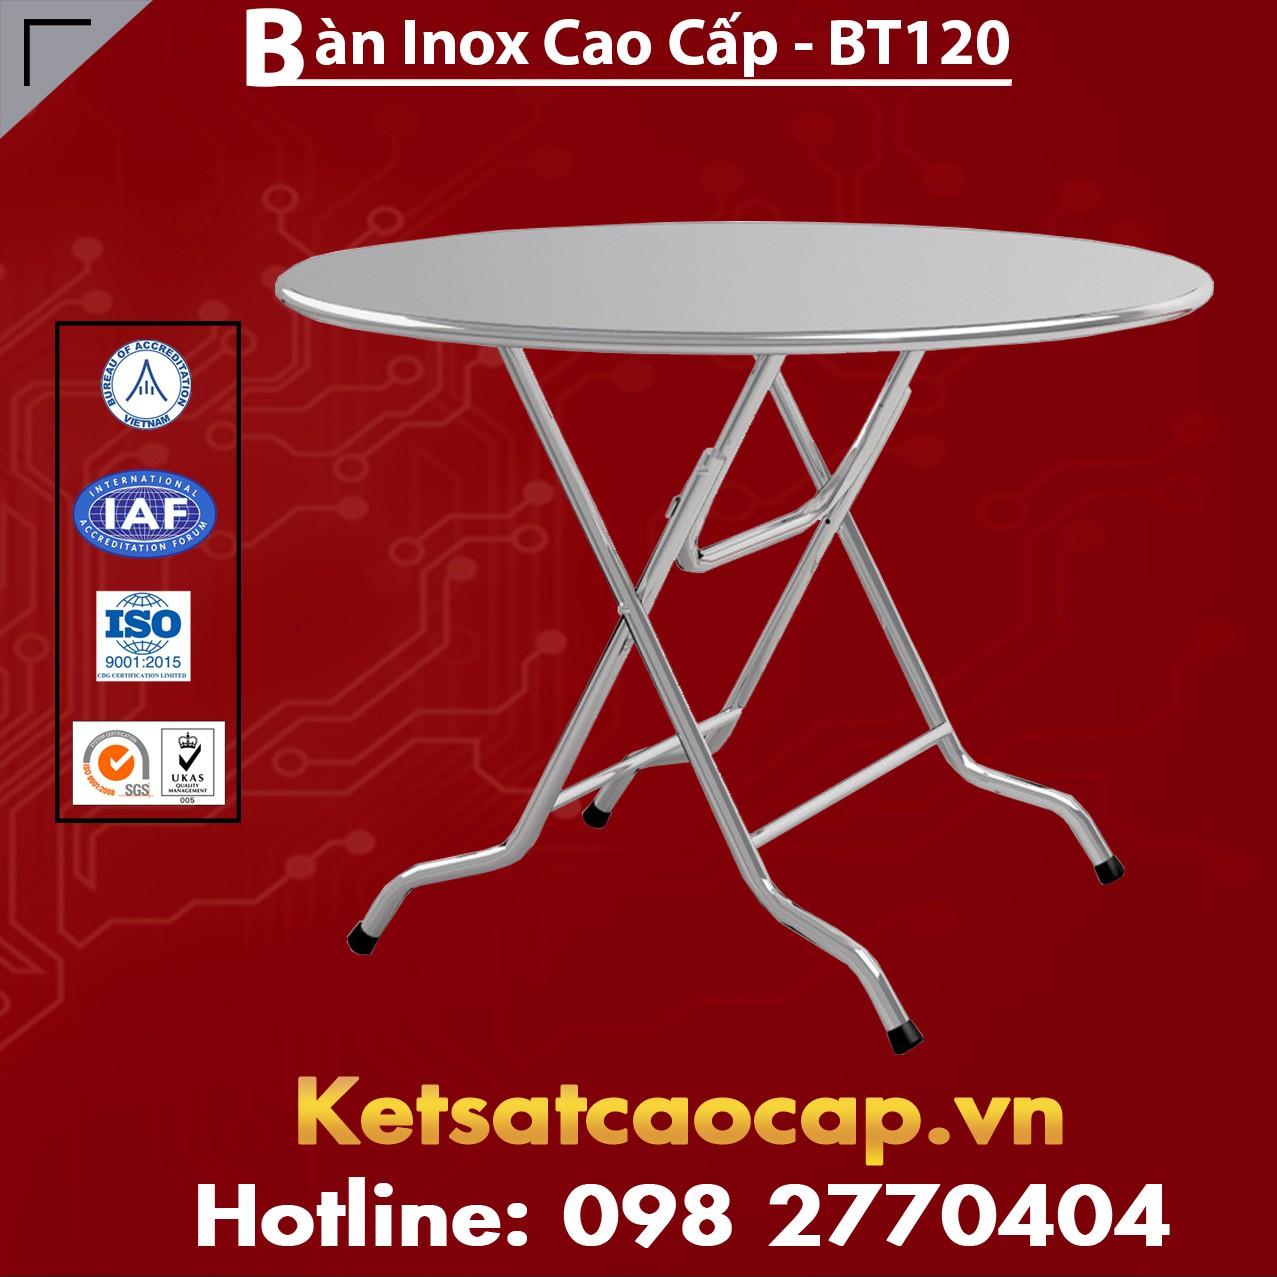 Bàn Inox Cao Cấp - BT120